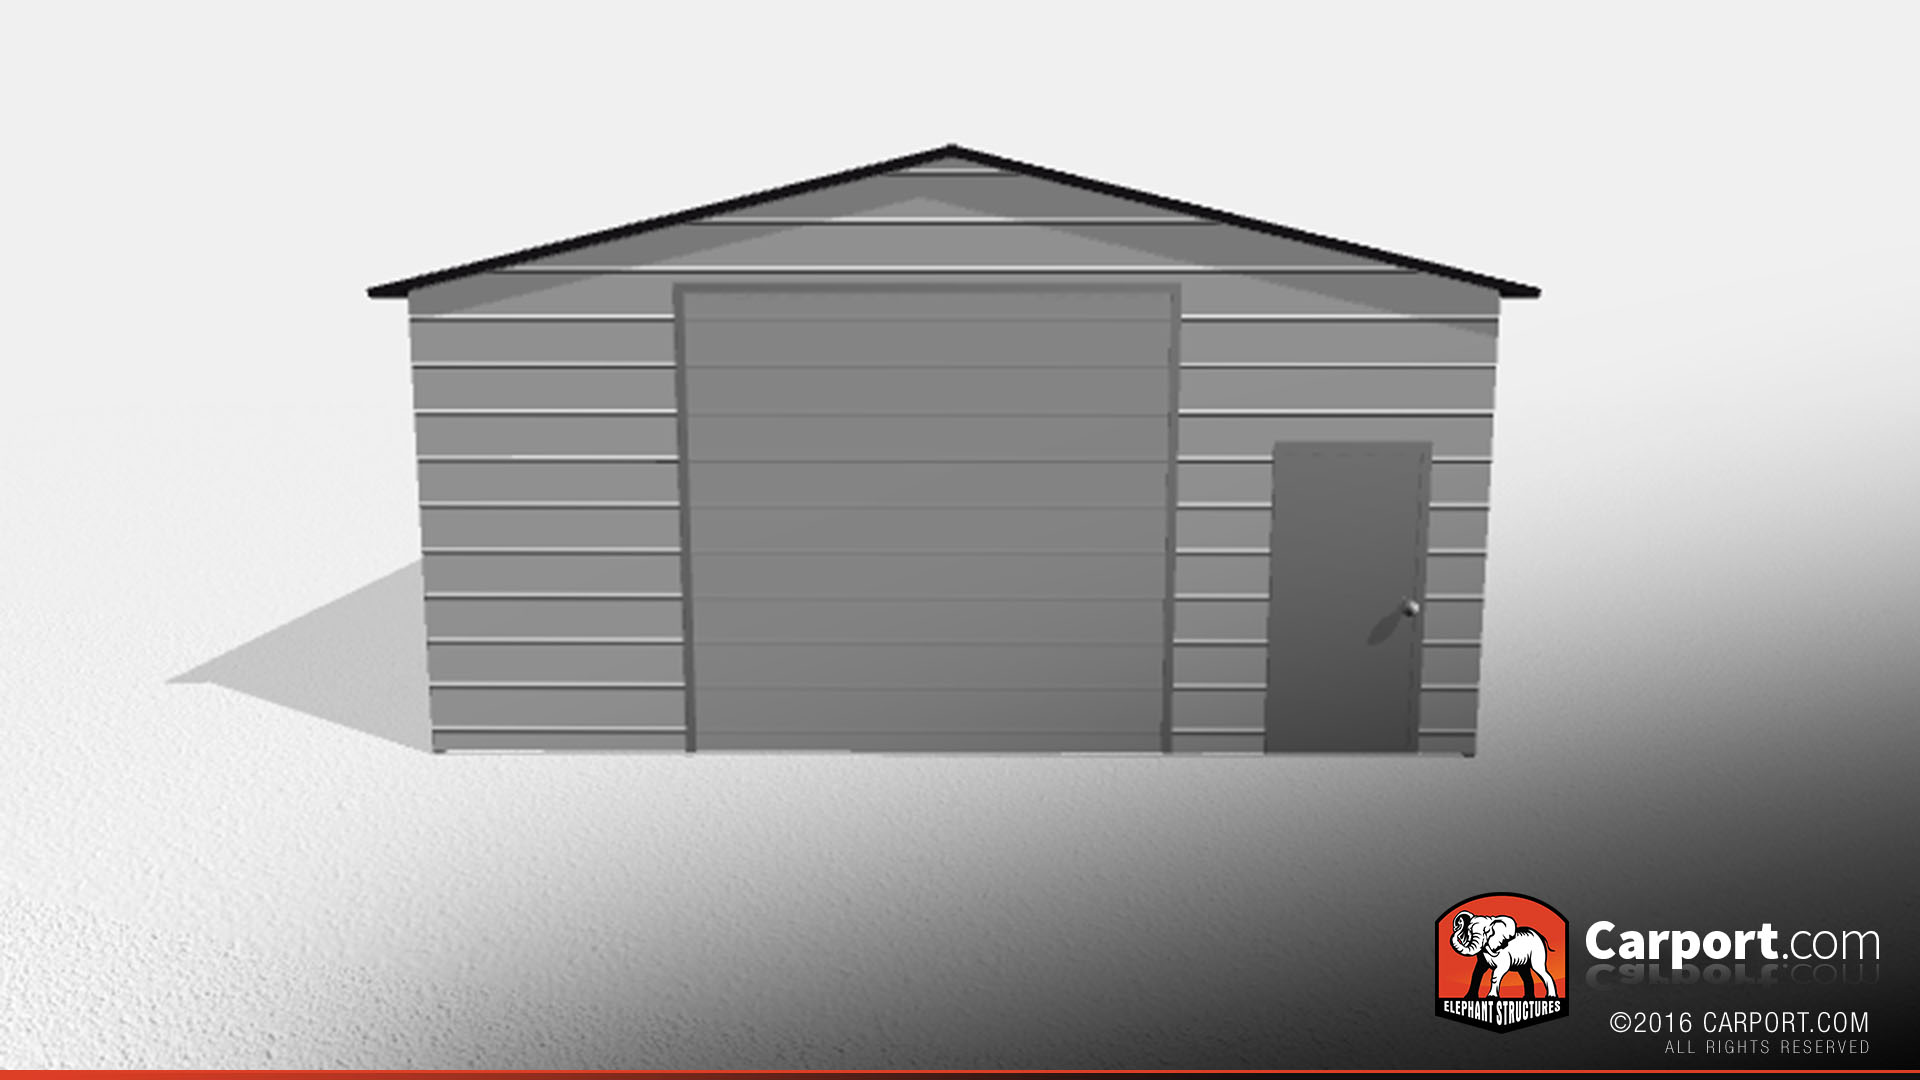 Double wide steel garage 22 39 x 36 39 x 10 39 shop metal for 36 x 36 garage